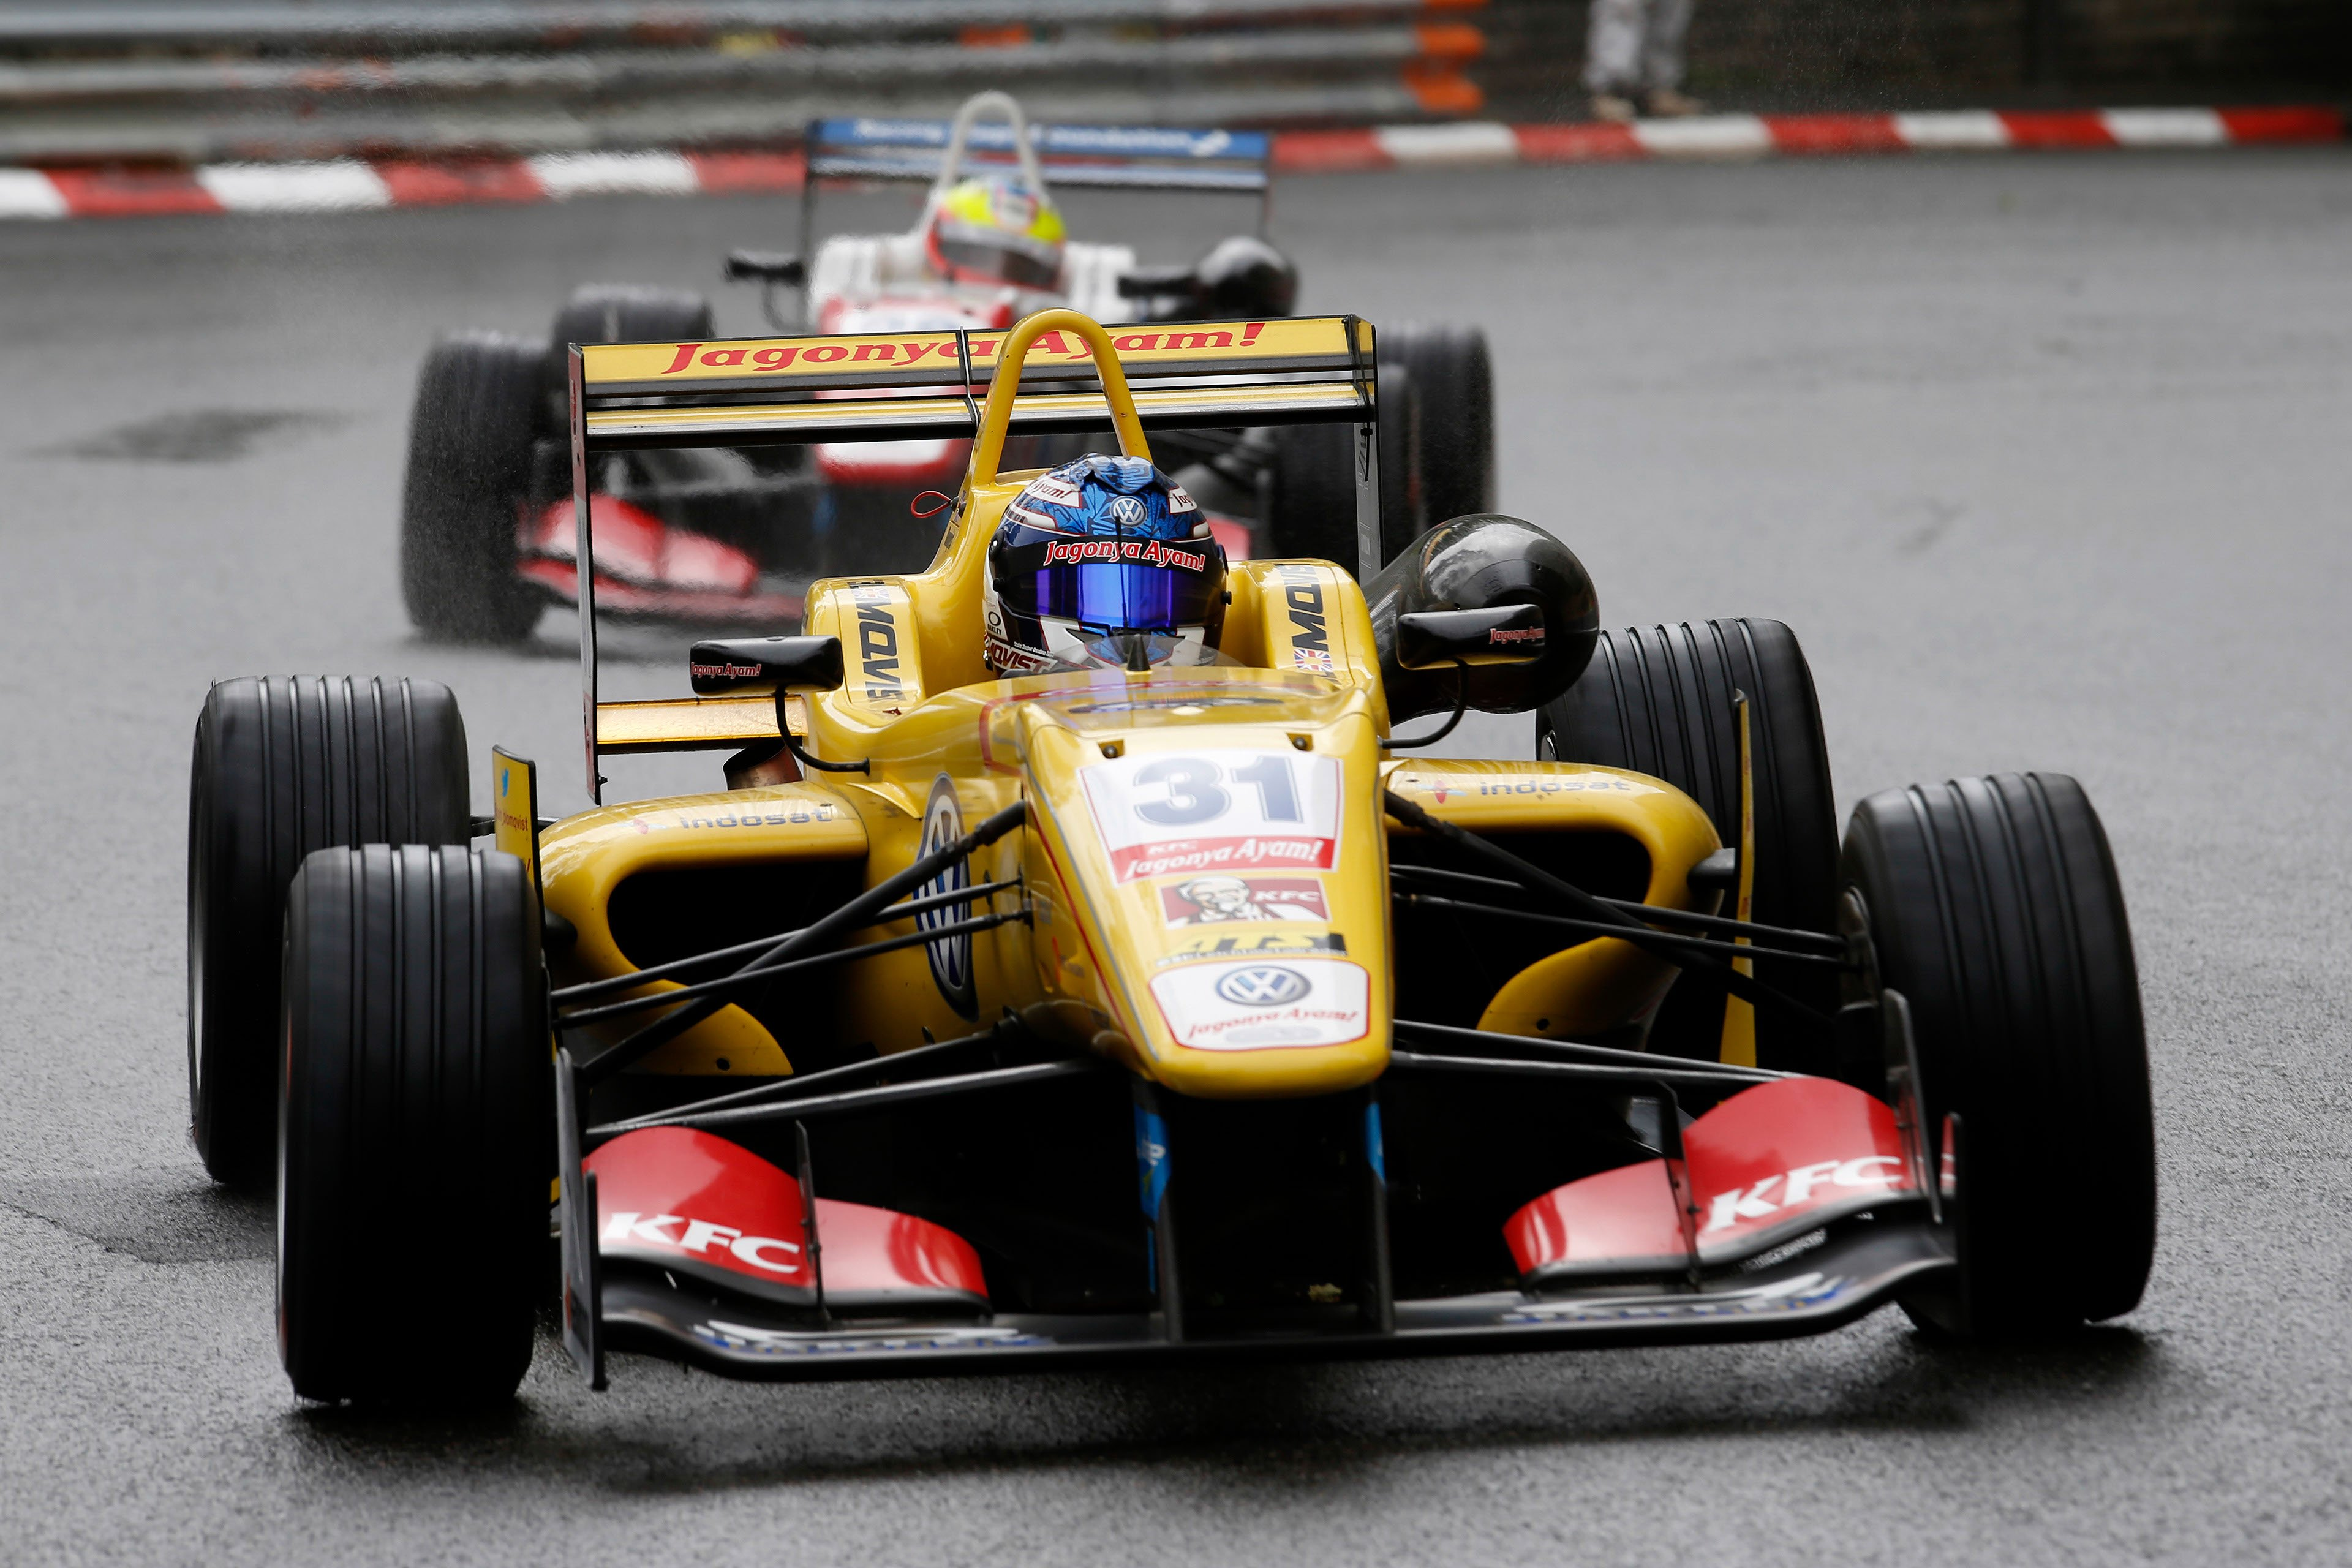 FIA Formula 3 European Championship, round 3, race 2, Pau (FRA)